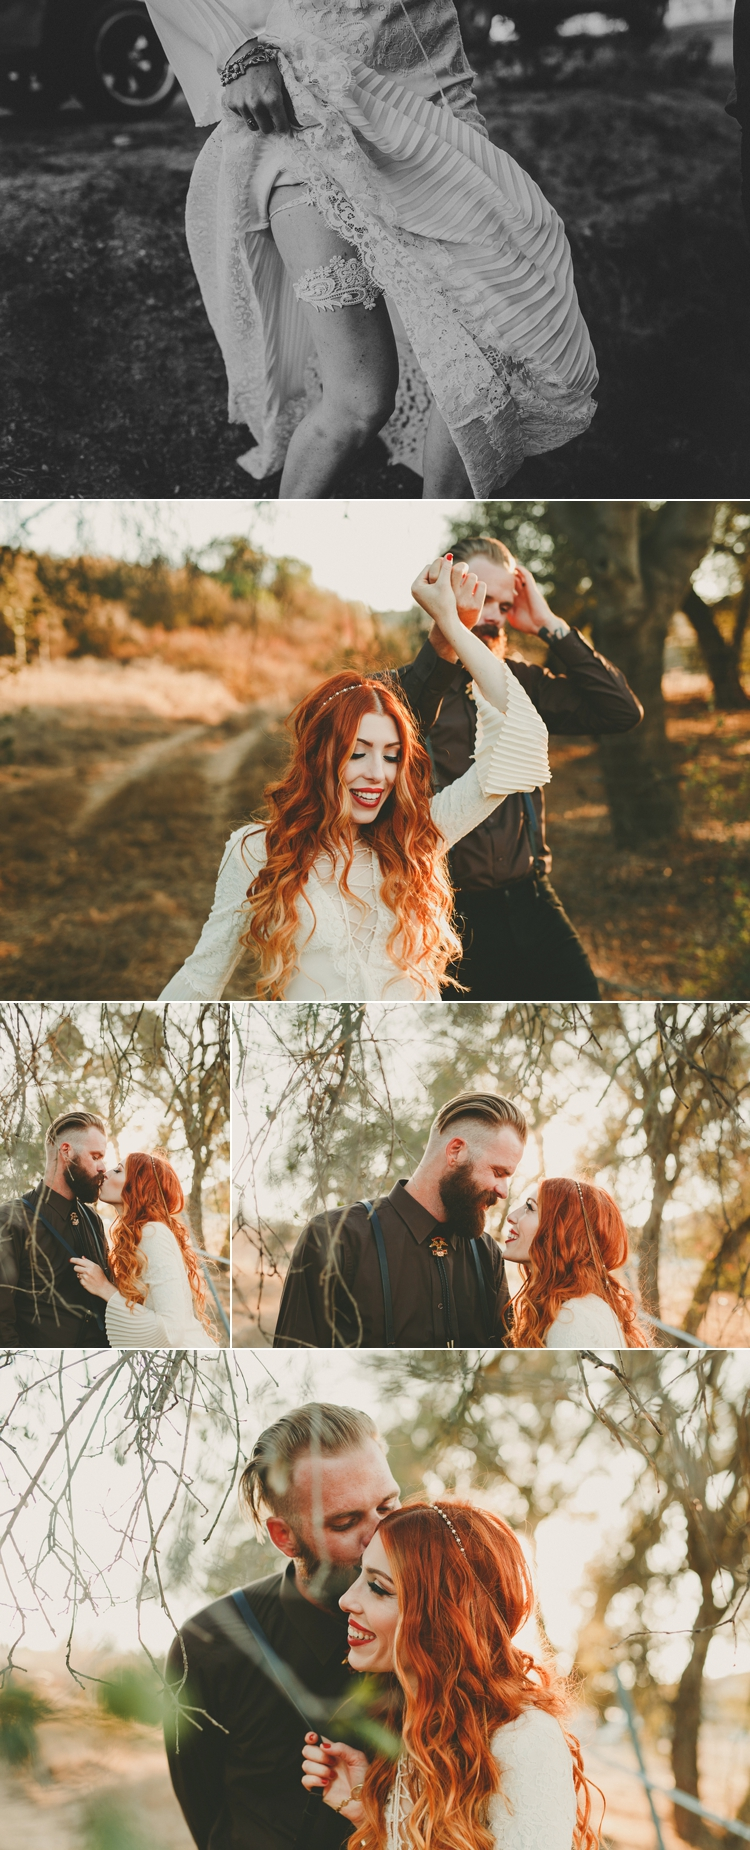 woodstock-inspired-wedding-photos-22